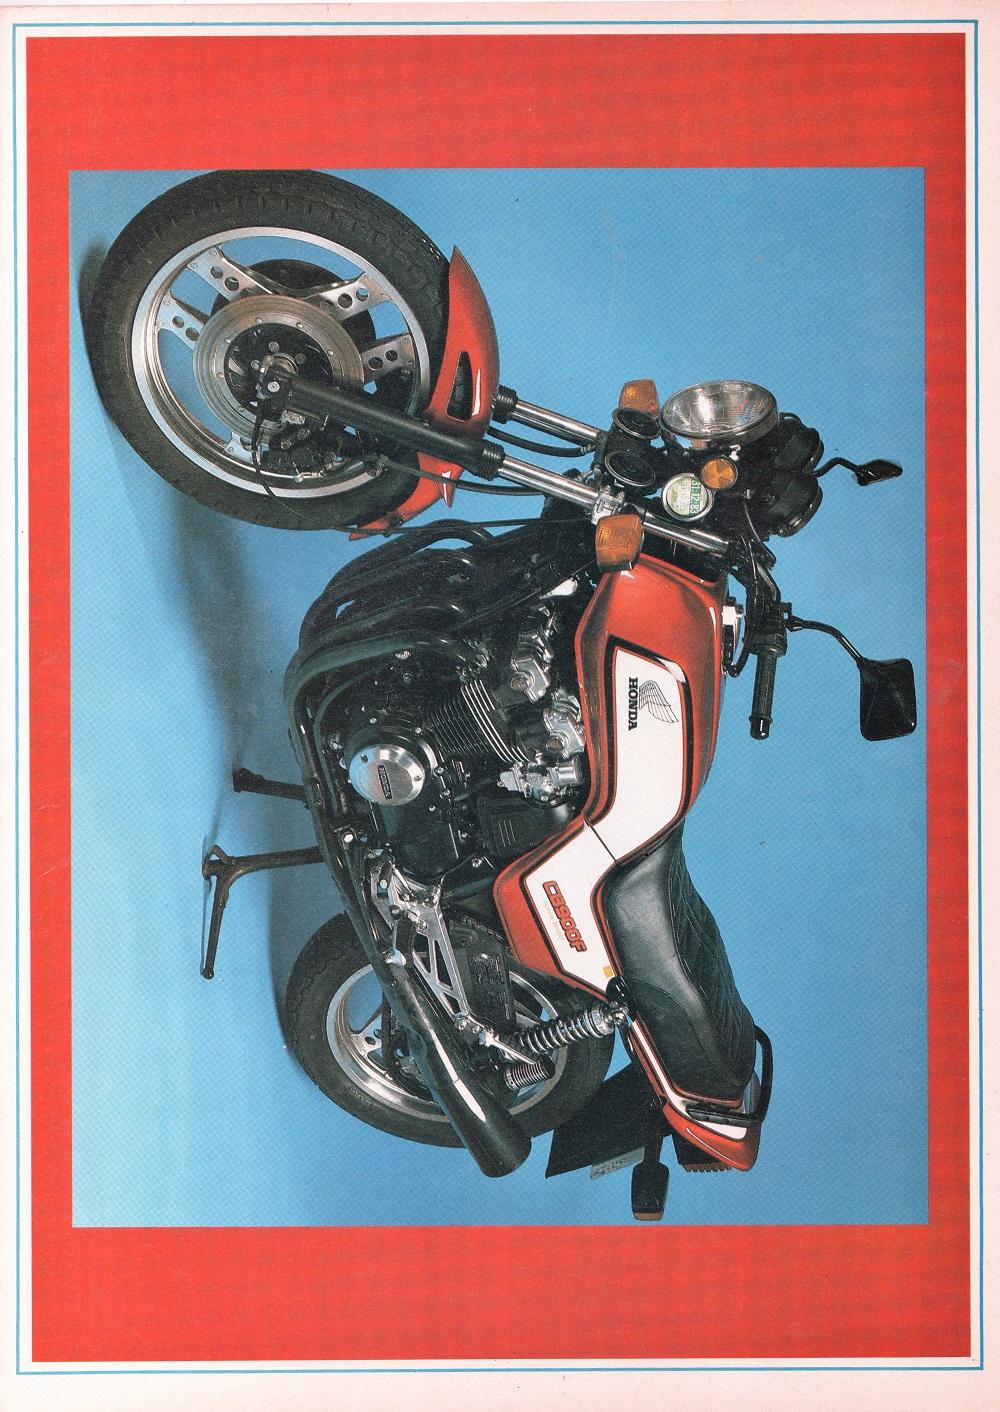 1983 Honda CB900F-D road test.2.jpg